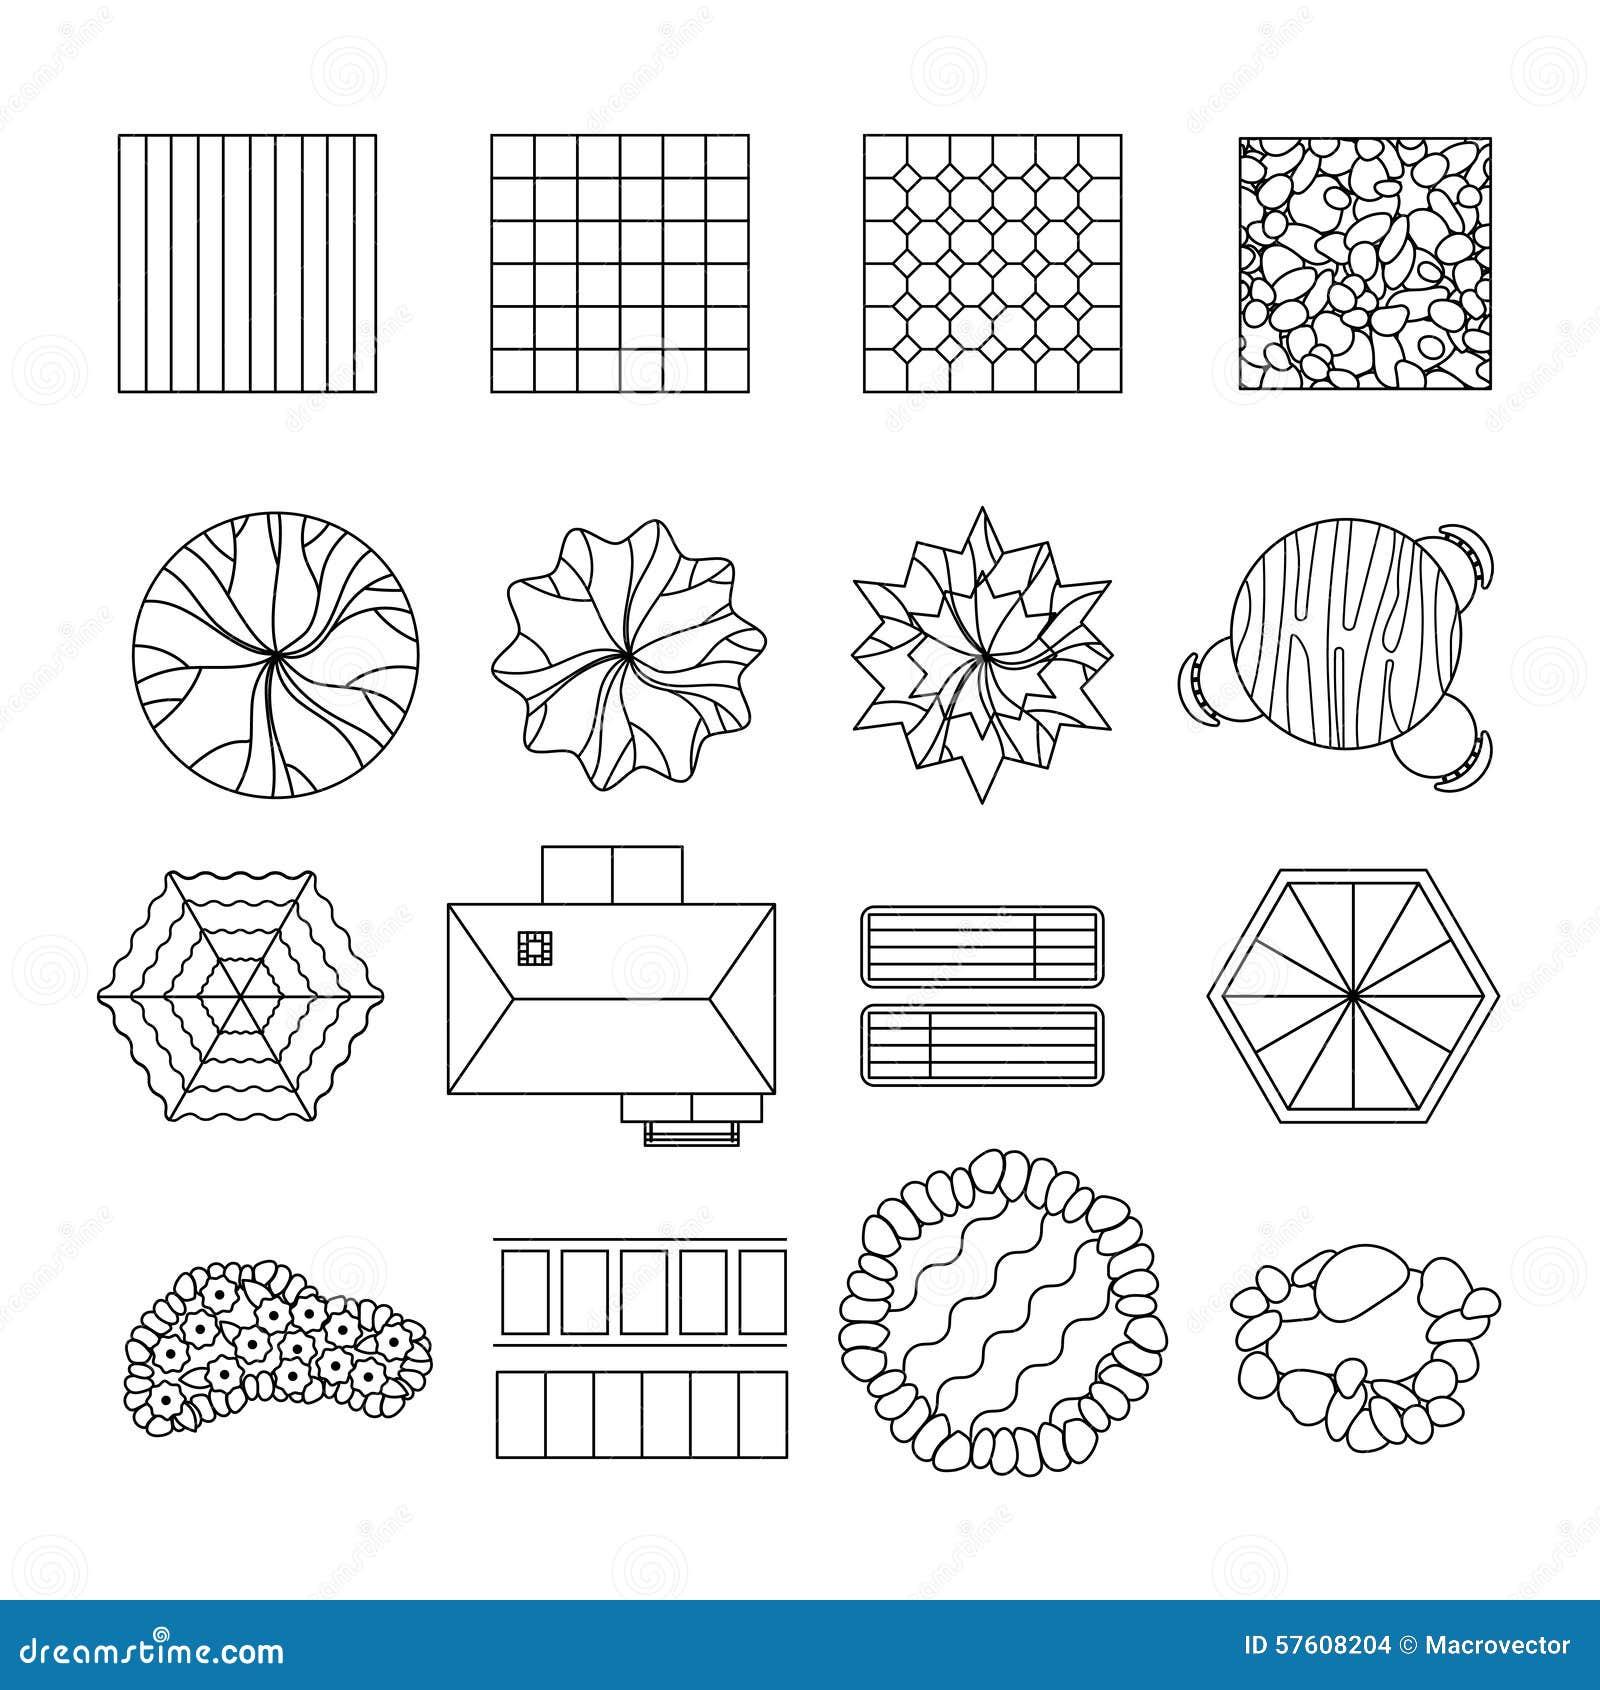 royalty free vector download landscape garden design elements - Garden Design Elements